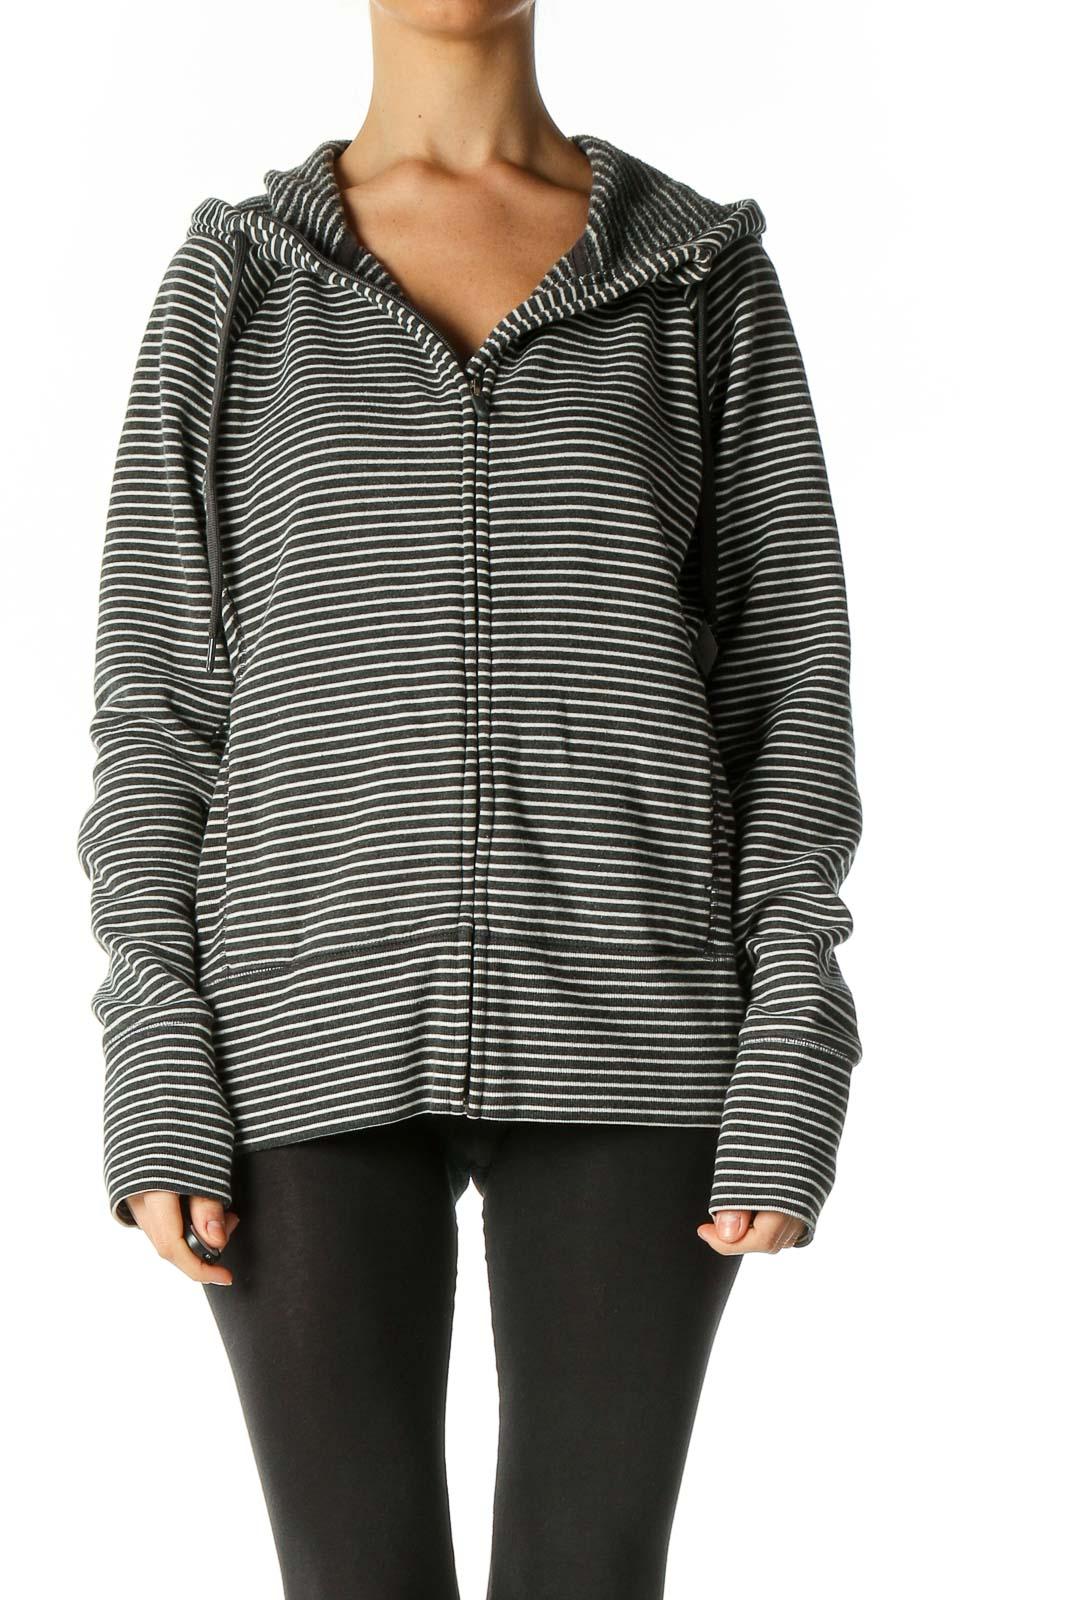 Black Striped Activewear Jacket Front